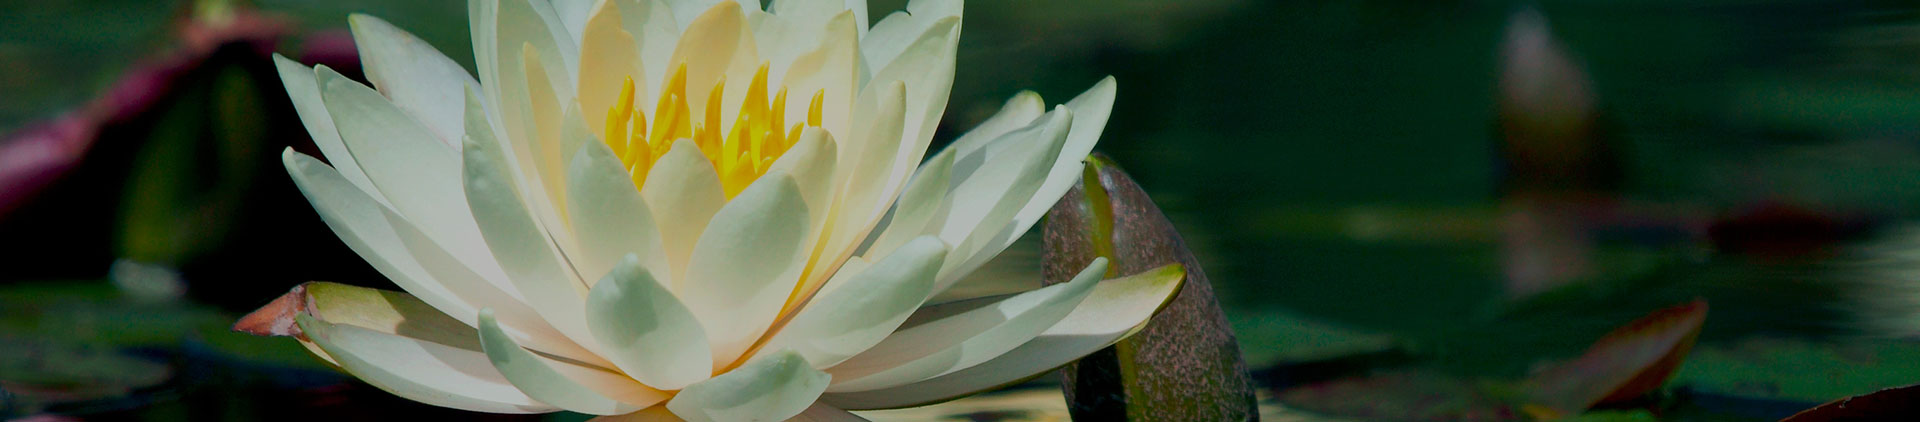 Obituaries | Risher Mortuary & Cremation Service